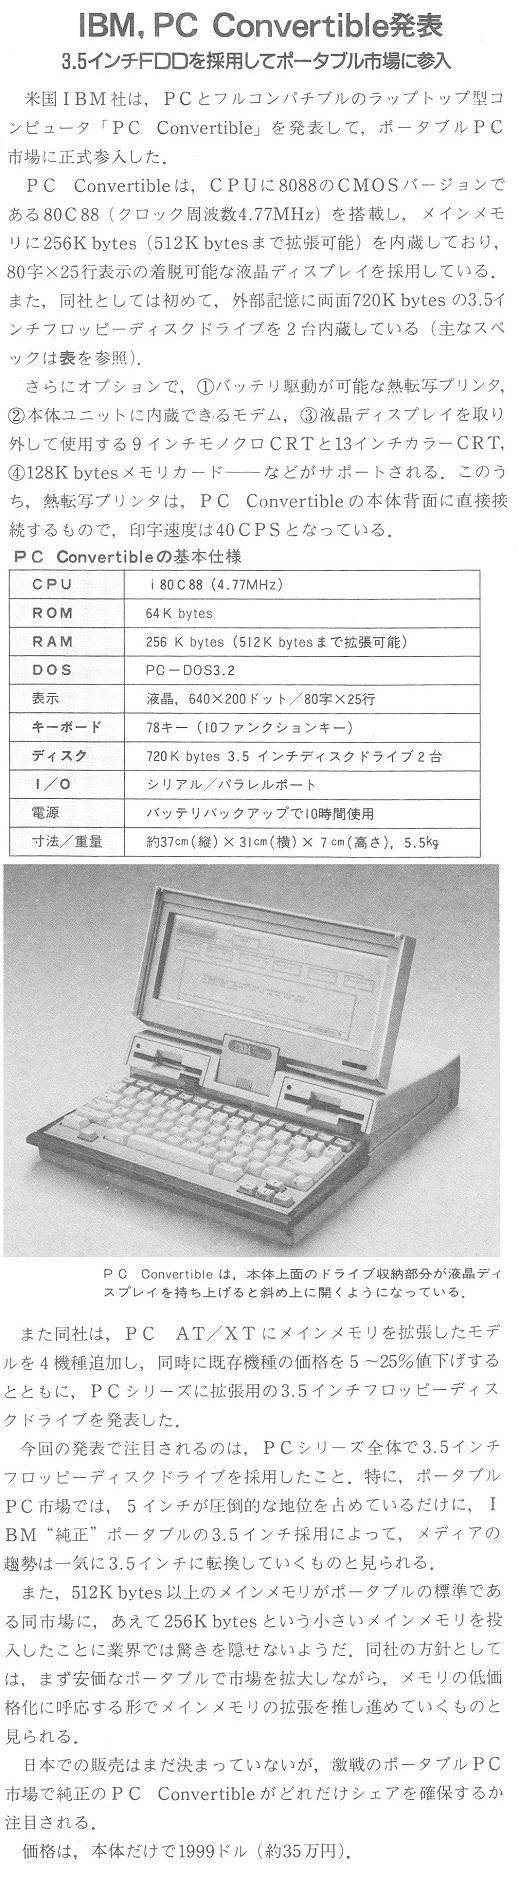 ASCII1986(06)b07_IBM_PC_Convertible_W520.jpg